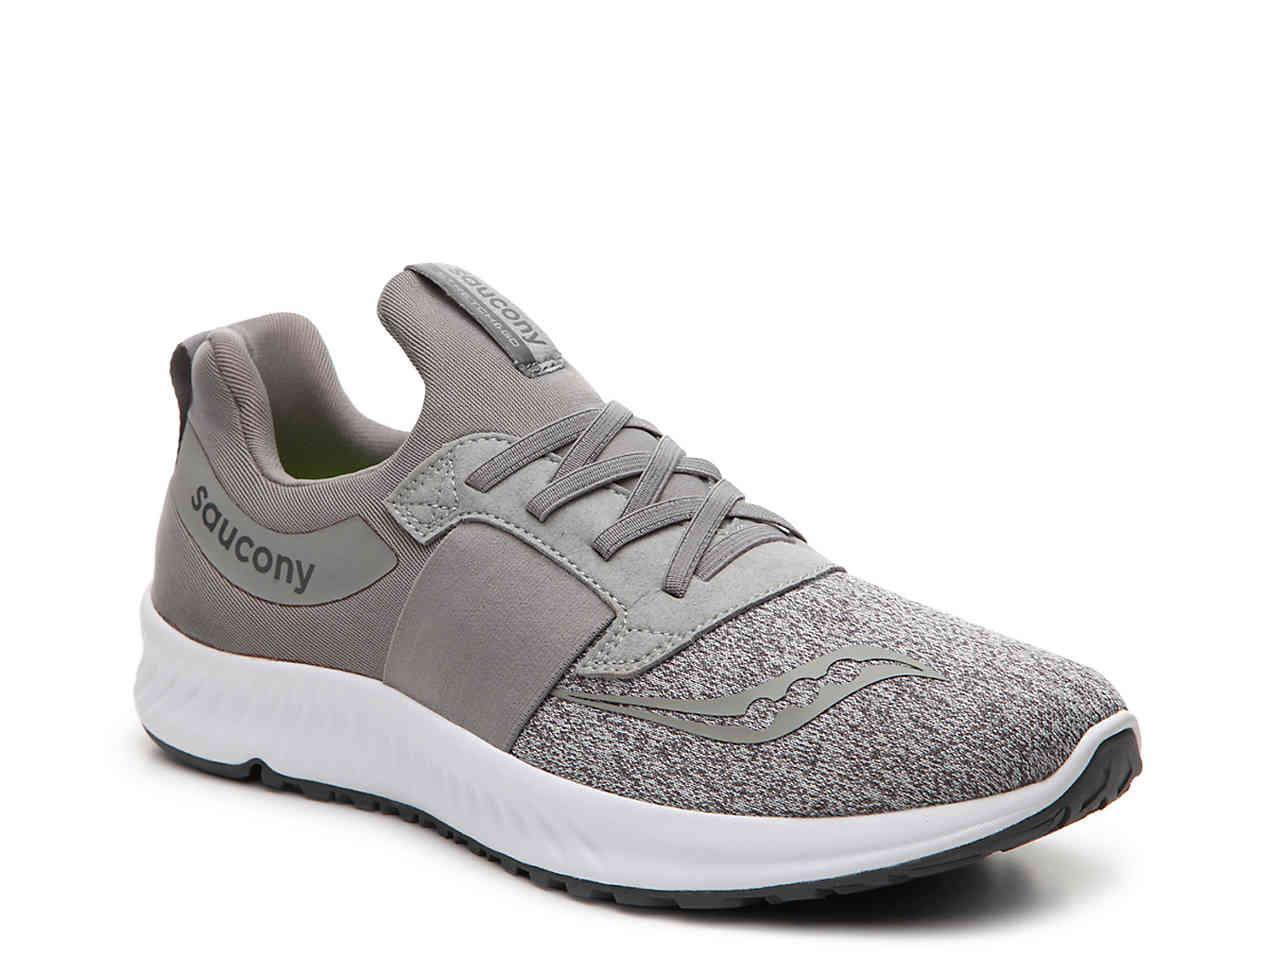 bd34f4b037 Saucony Gray Stretch & Go Breeze Lightweight Slip-on Running Shoe for men